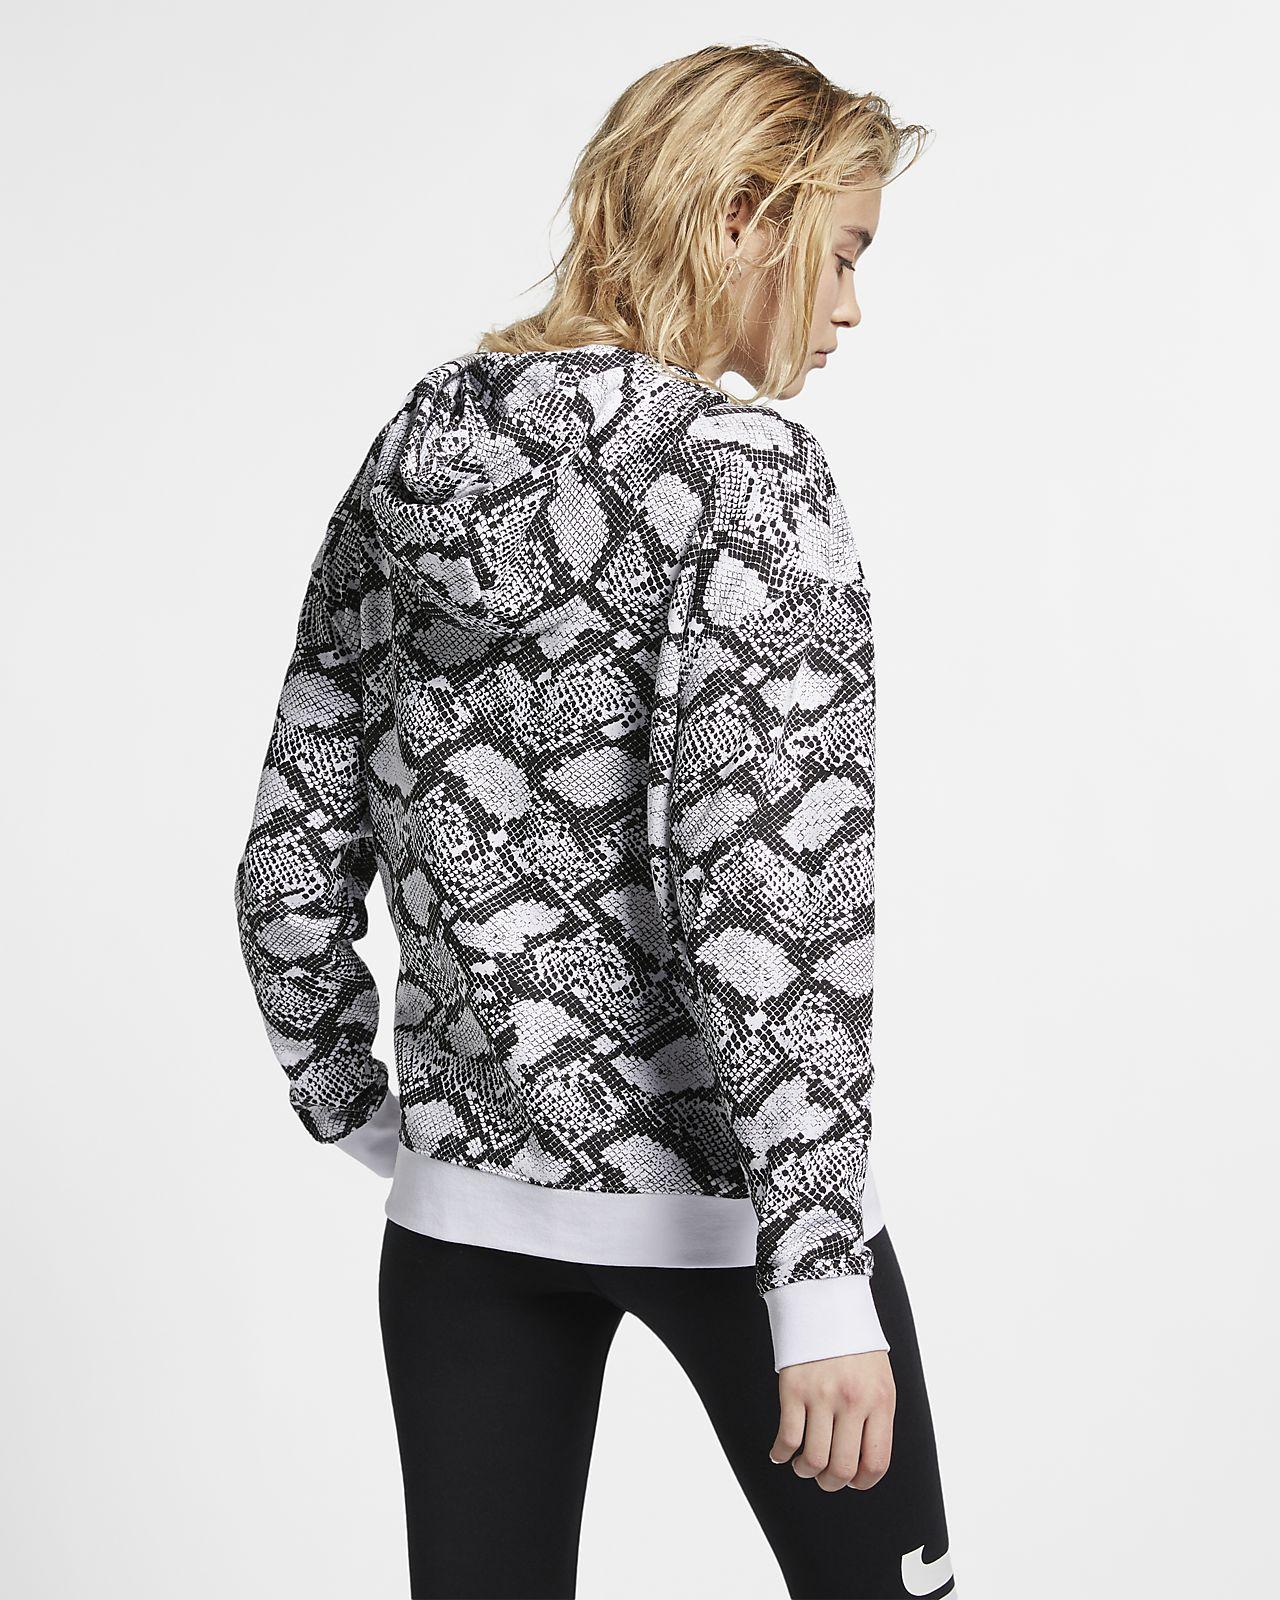 3aedcdc0a051 Γυναικεία μπλούζα με κουκούλα Nike Sportswear με animal print. Nike ...